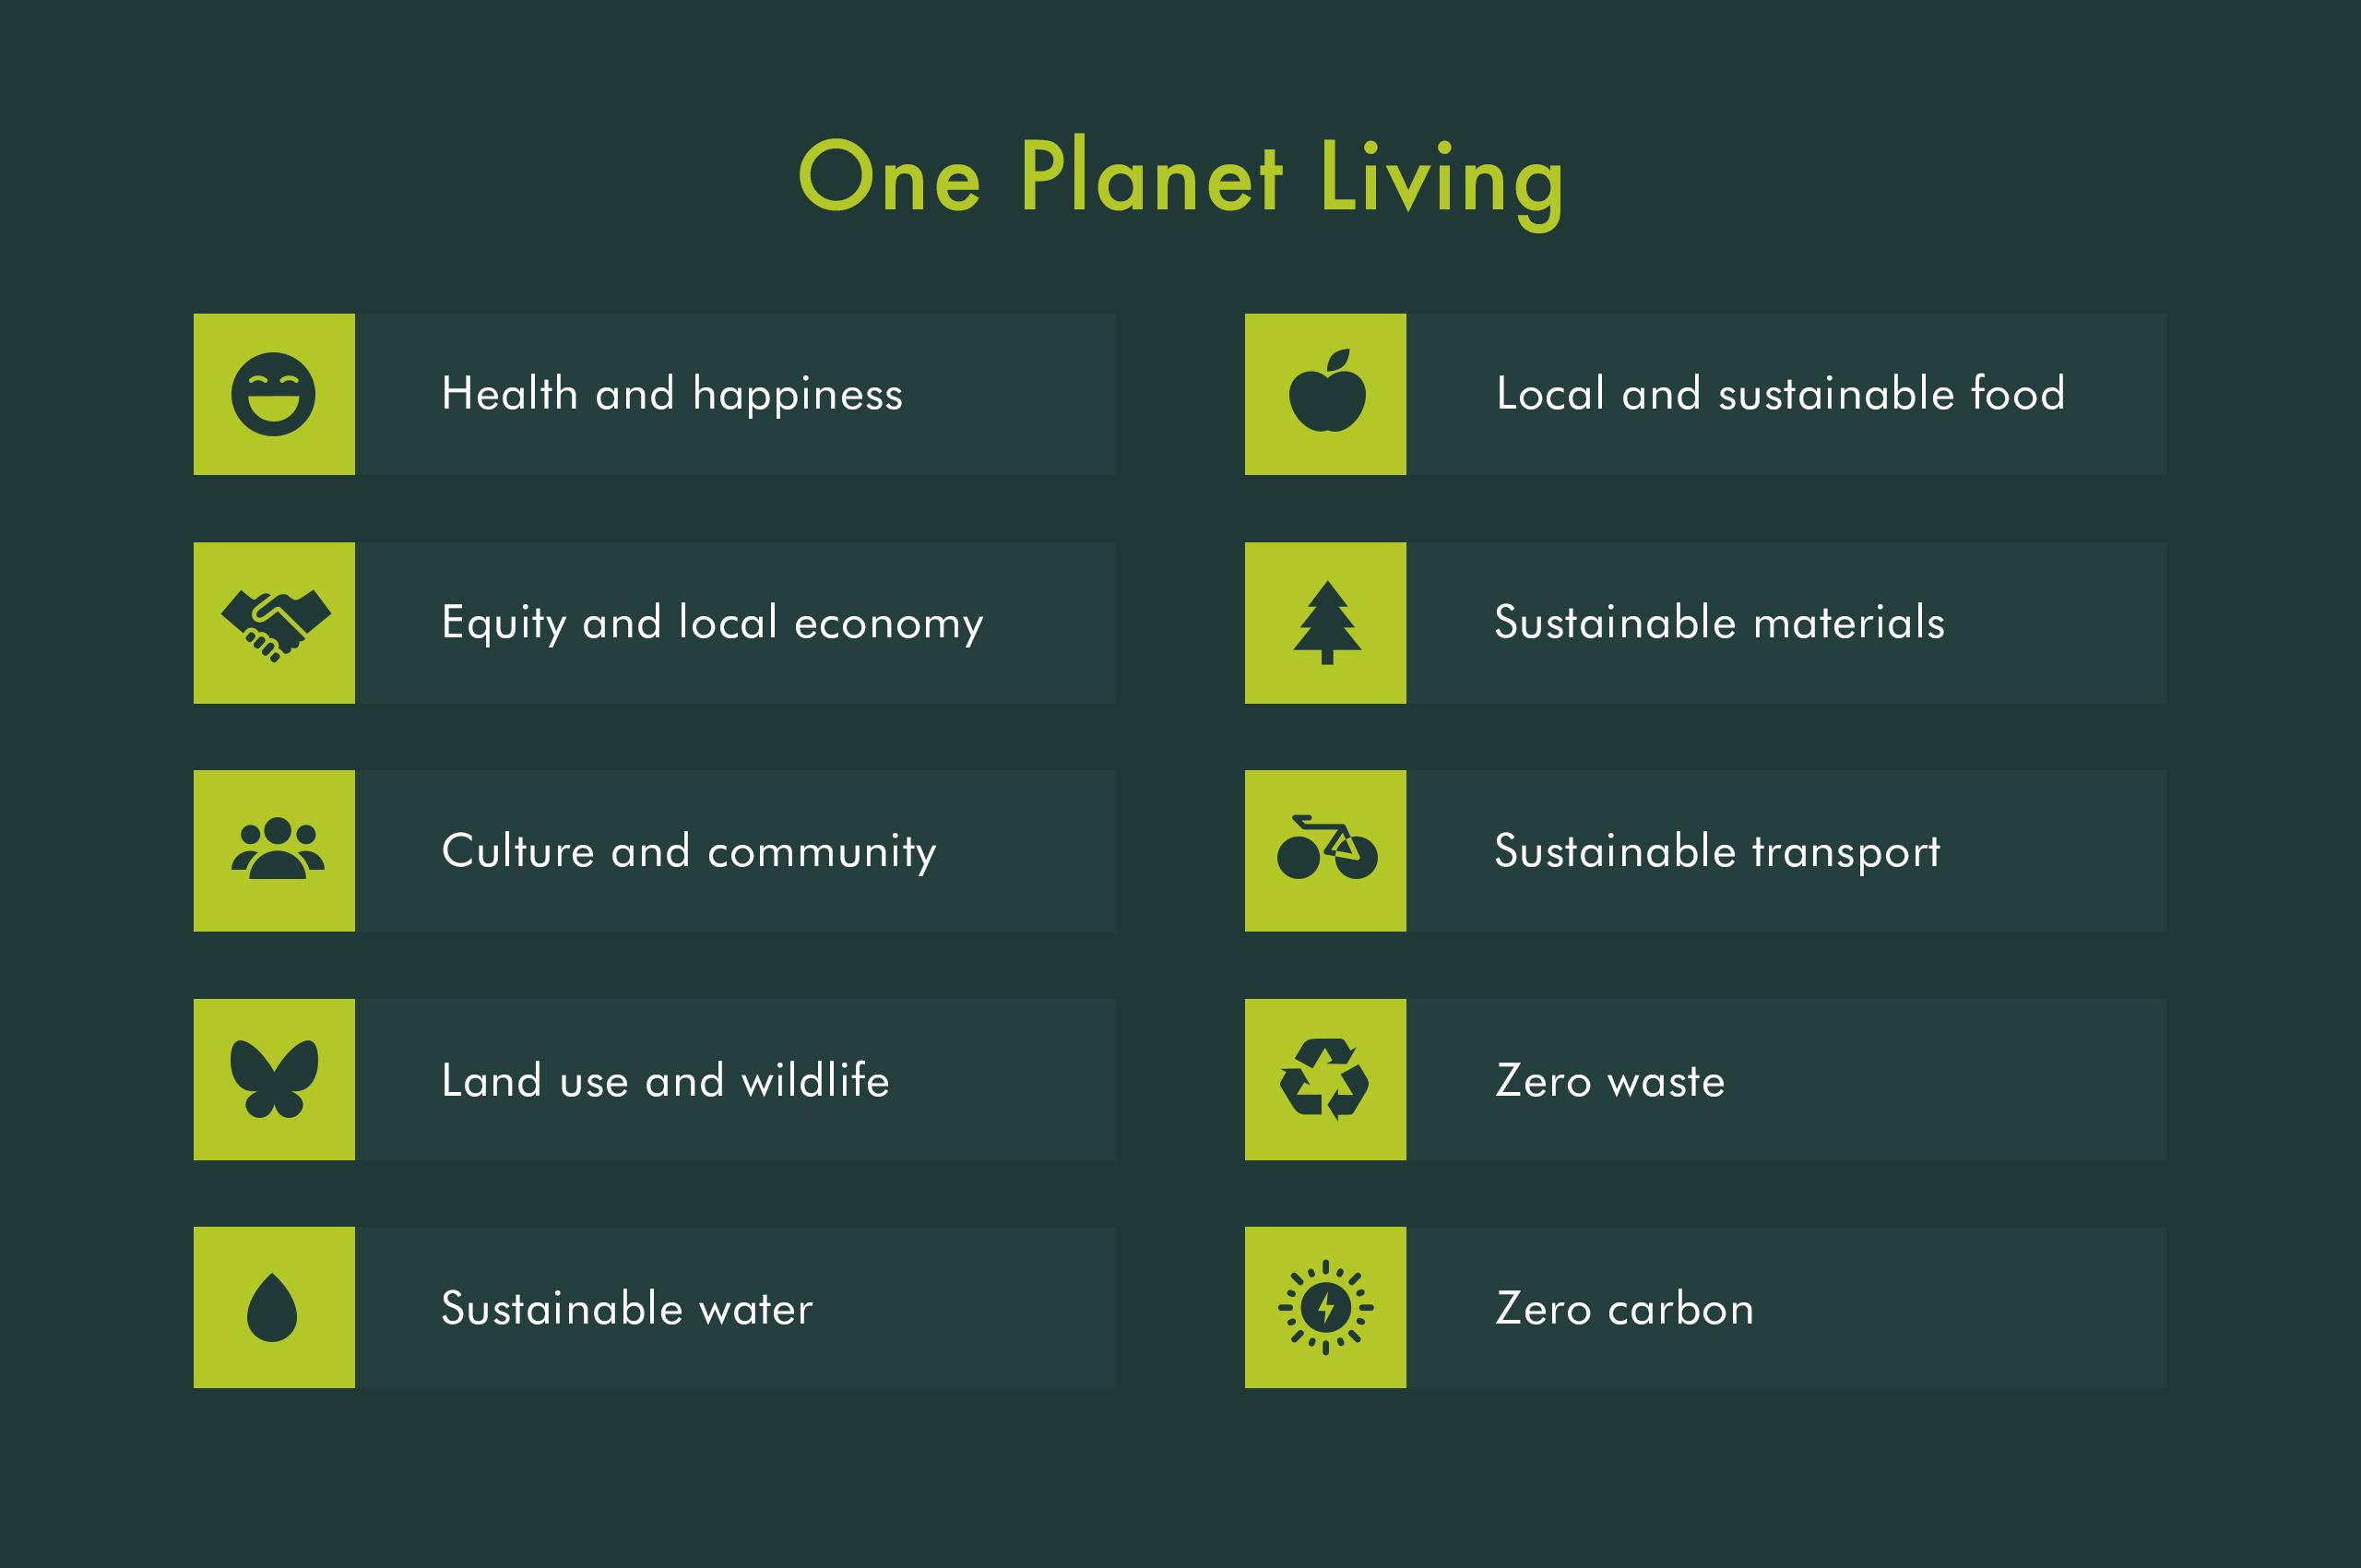 One Planet Living | Lamington Group